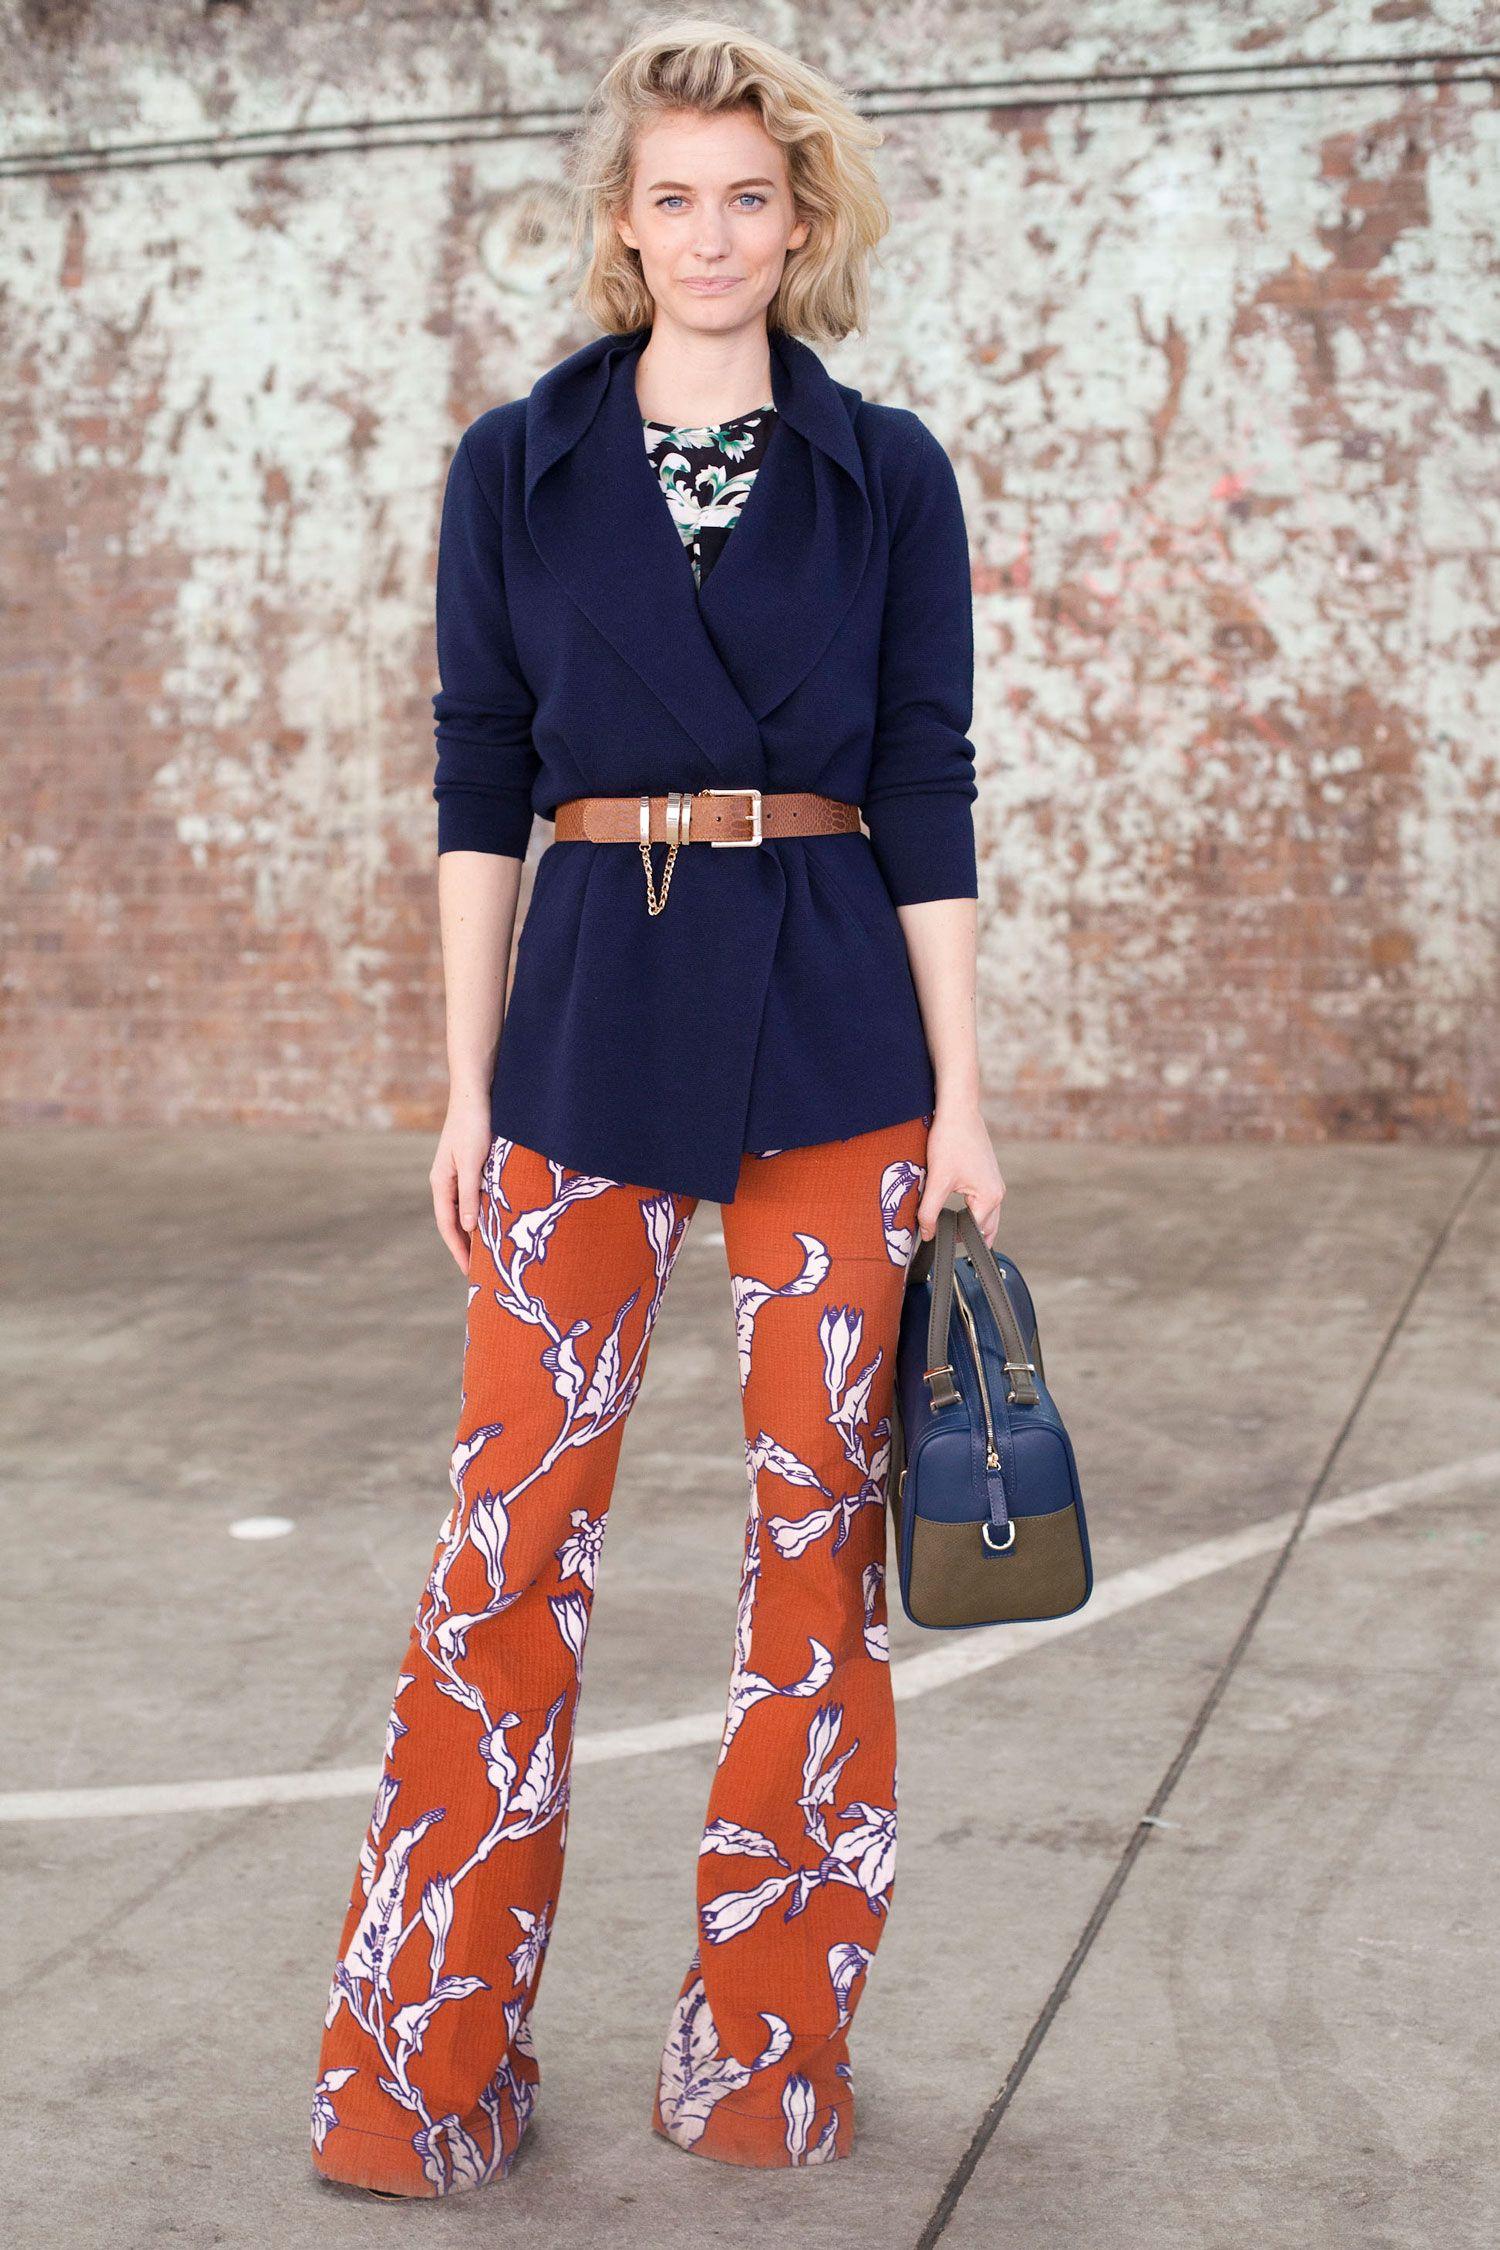 b8cfe0a19d0 73 Stunning Street Style Looks From Australian Fashion Week -  Cosmopolitan.com